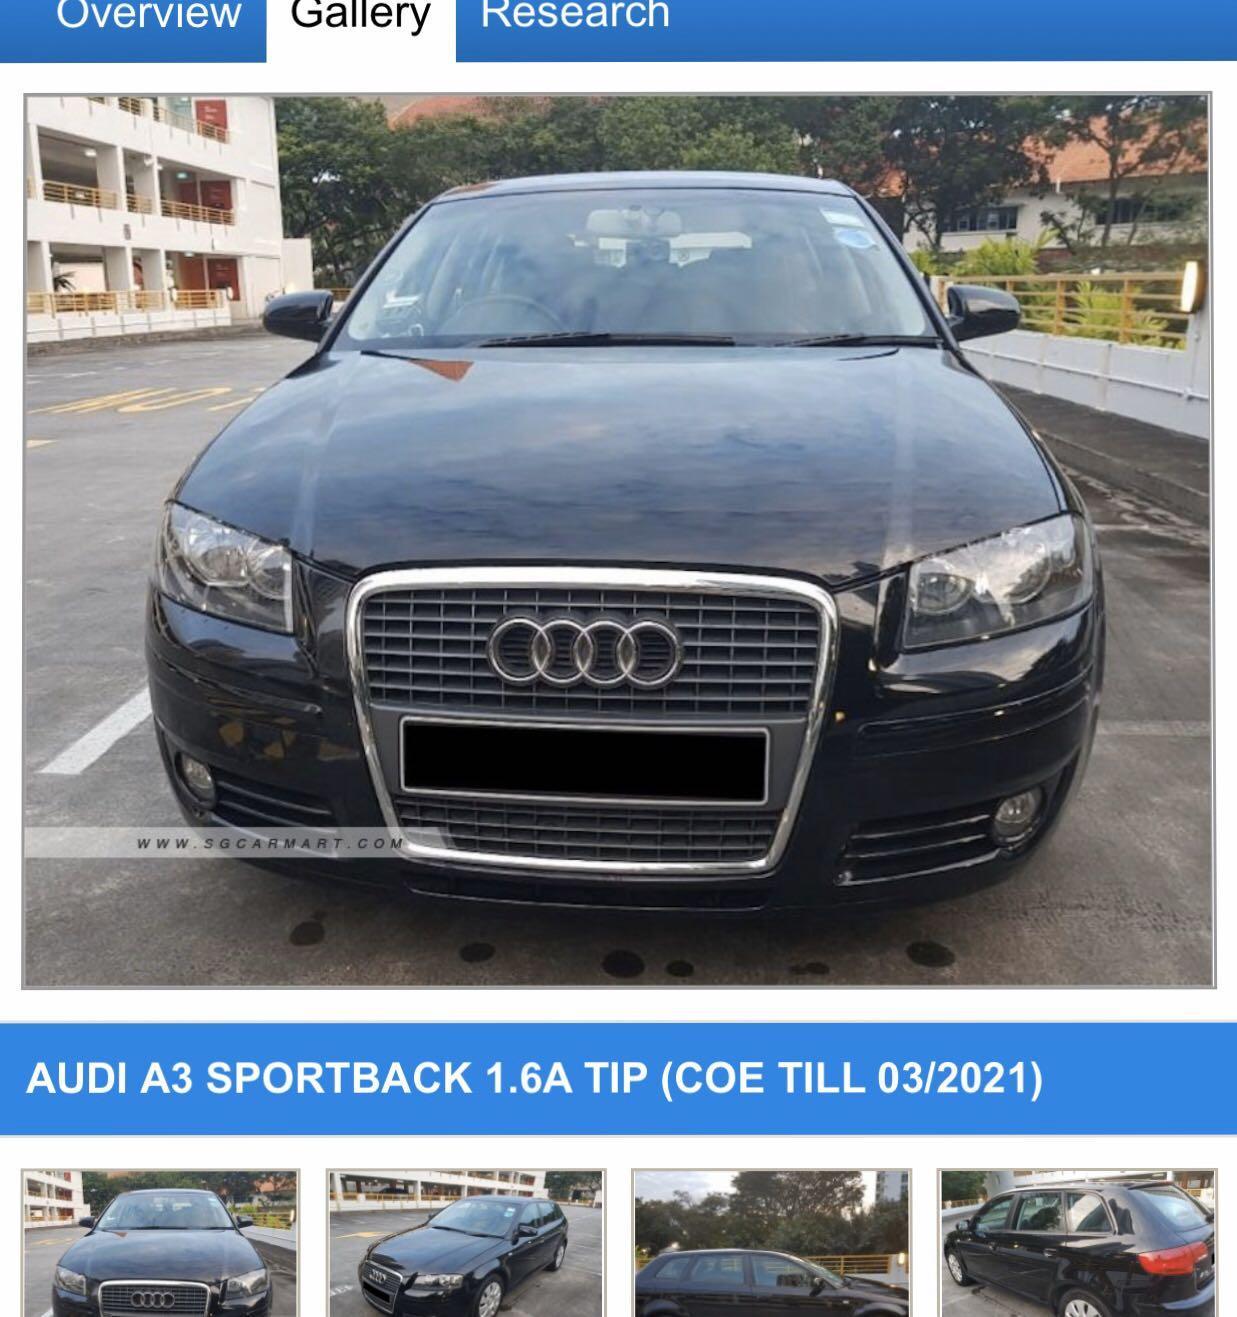 Audi A3 Sportback 1.6 5-Dr (A)